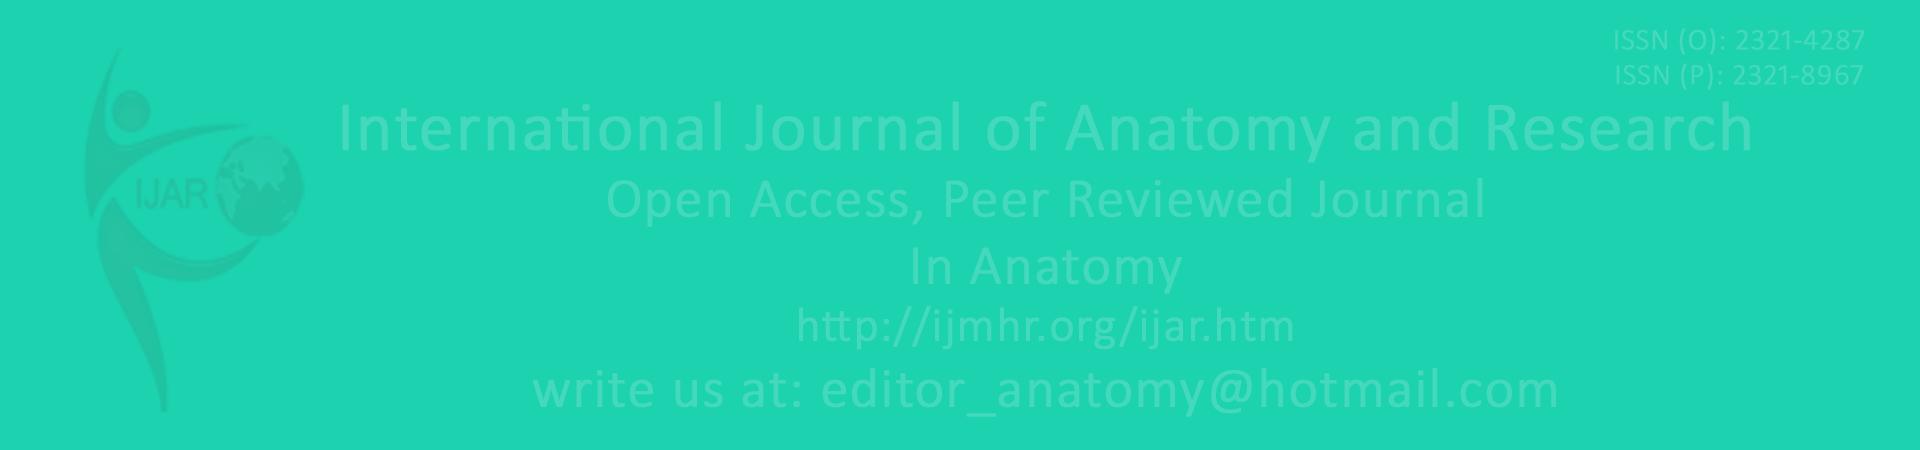 IJAR | Anatomy | International Journal of Anatomy and Research | Int ...